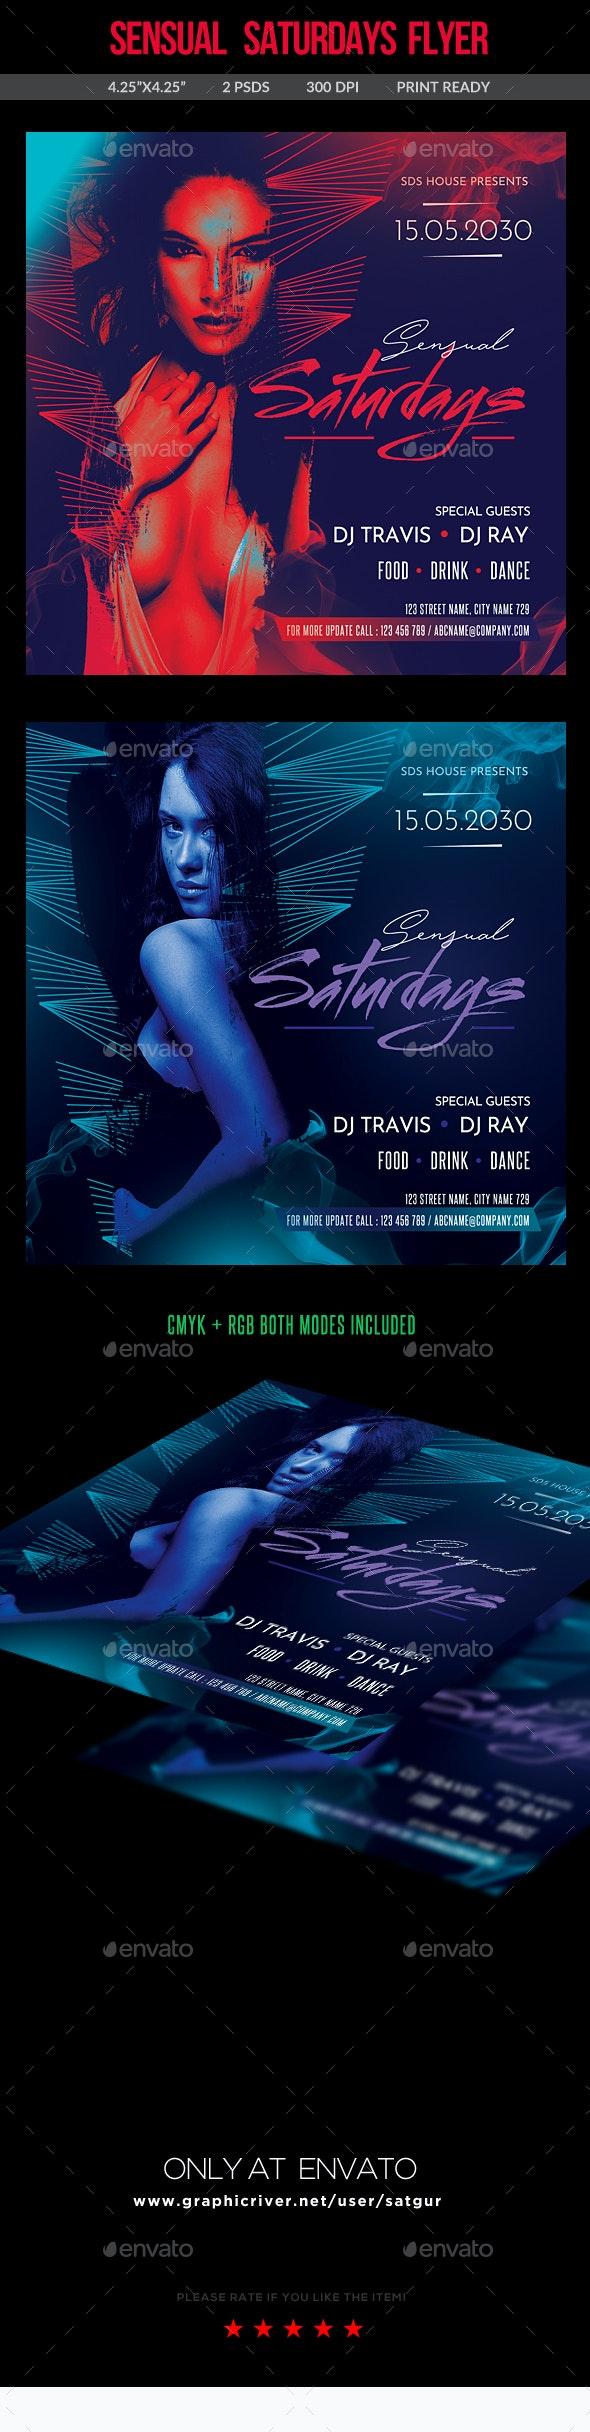 Sensual Saturdays Flyer - Clubs & Parties Events